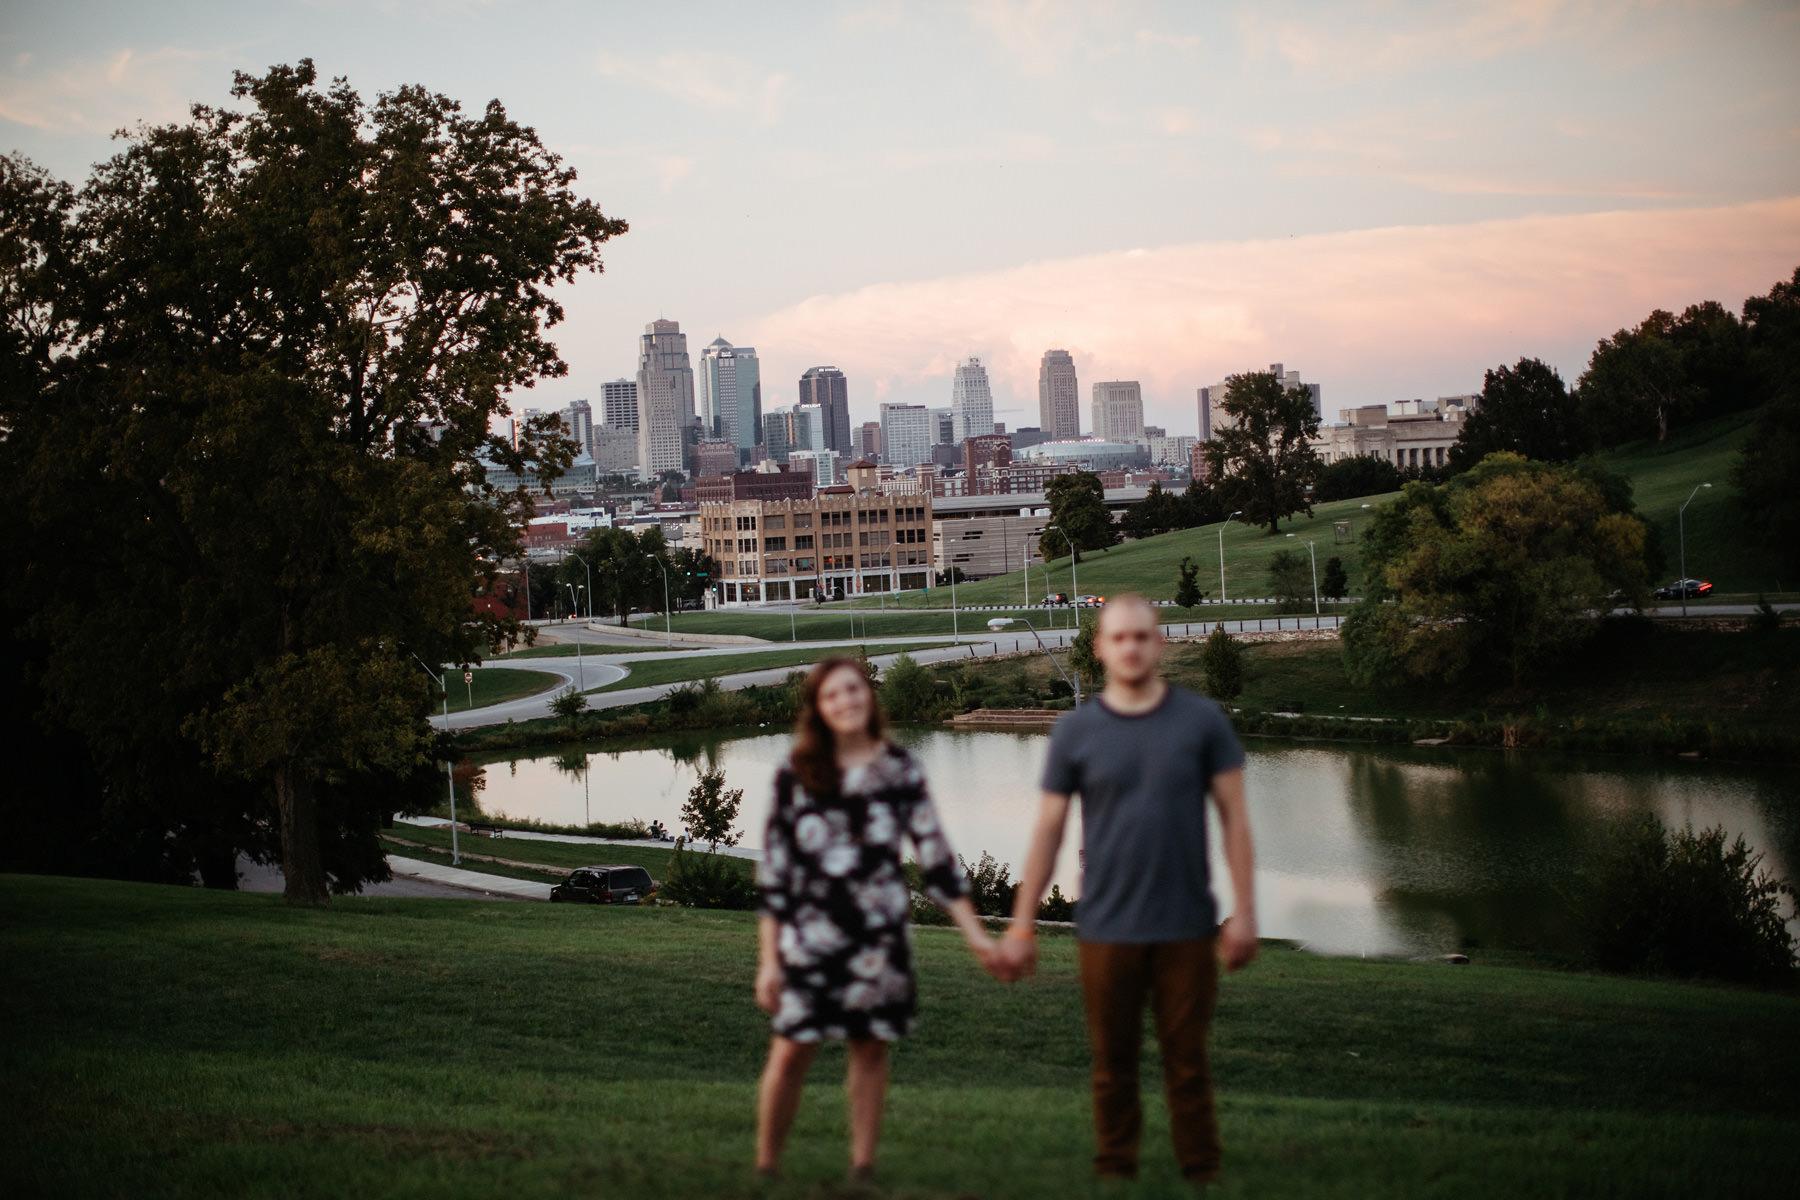 Kansas City_Penn Valley Park_Engagement Session_Kindling Wedding Photography52.JPG